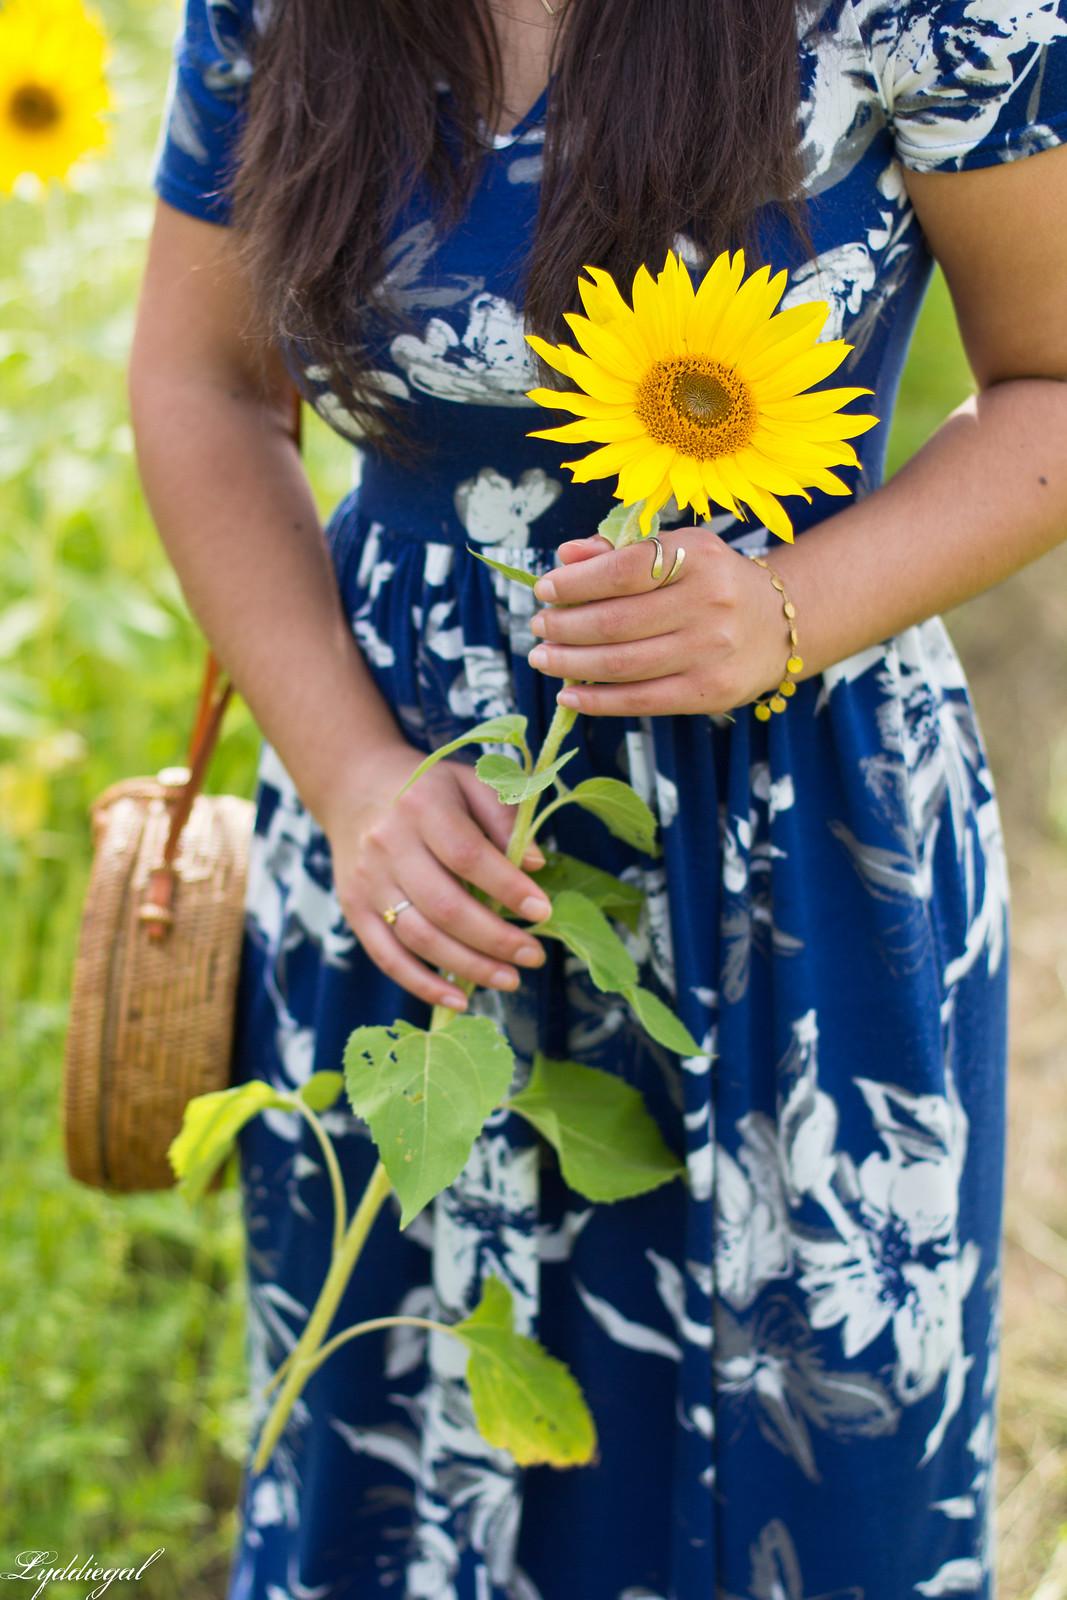 671f31d850d90 ... blue floral maxi dress, round rattan bag, straw hat, sunflower field-13  ...